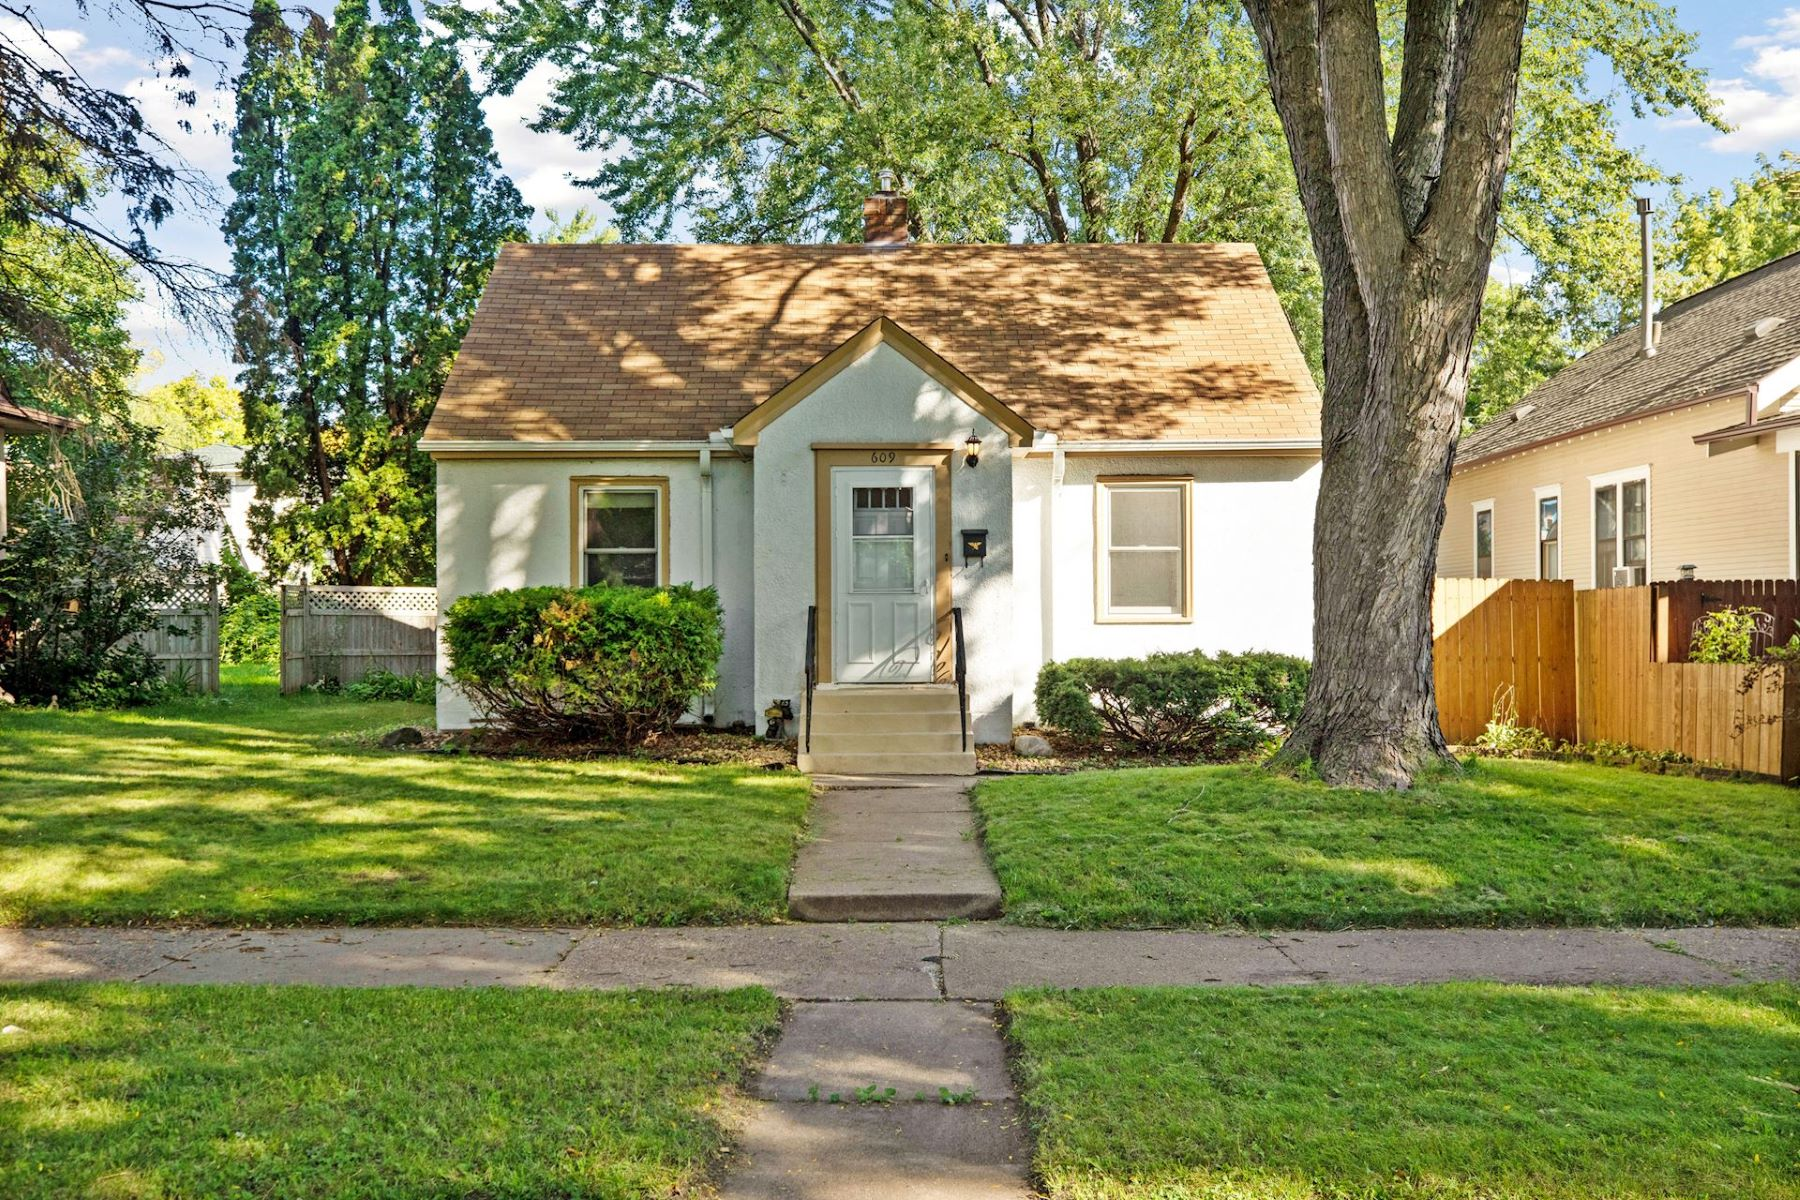 Single Family Homes for Sale at 609 Geranium Avenue E St. Paul, Minnesota 55130 United States